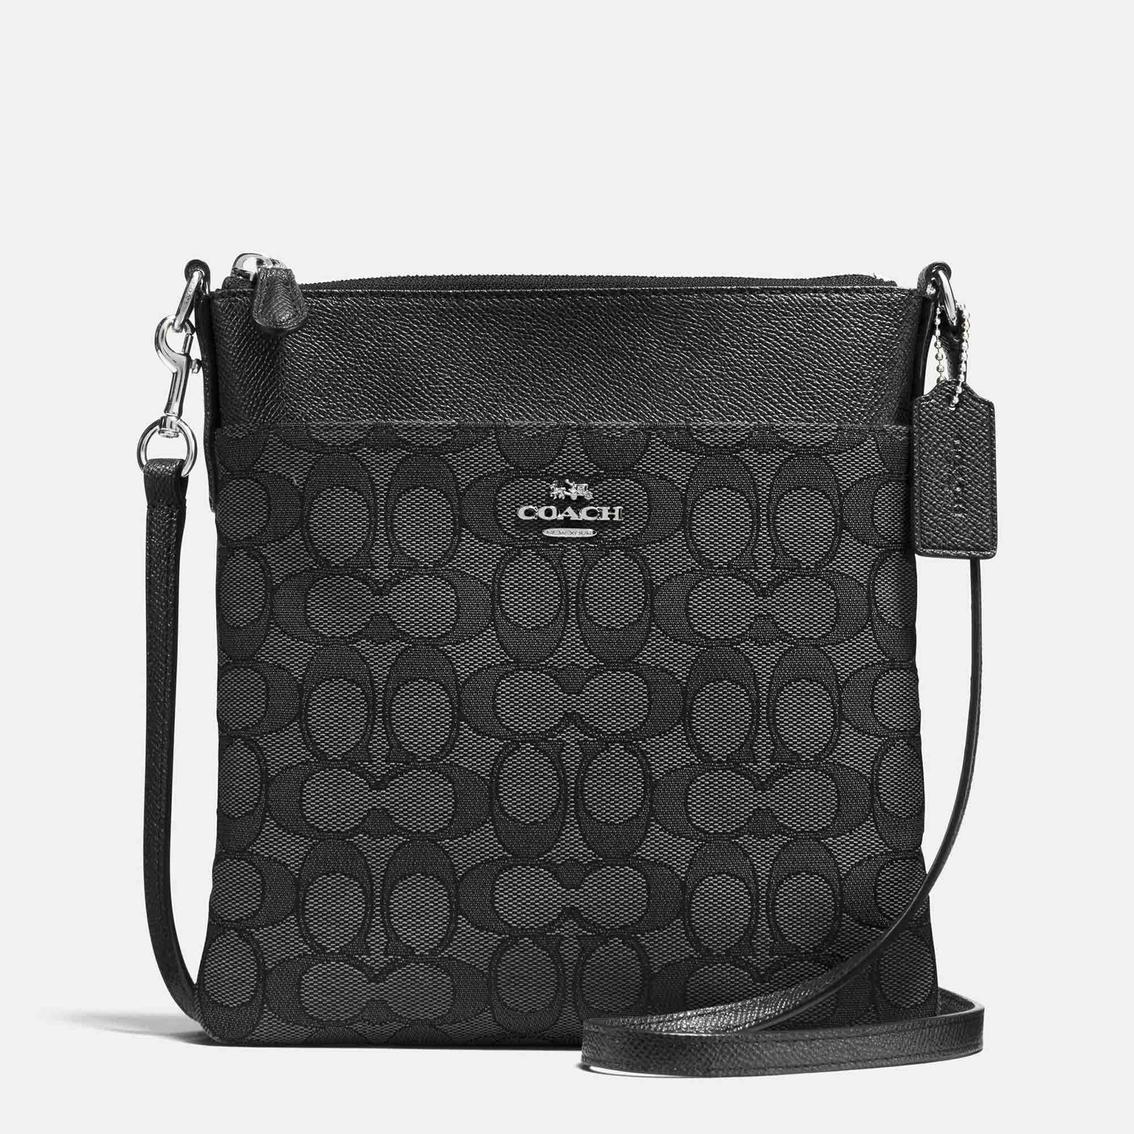 1fc3c570d95 Coach Messenger Signature Jacquard Crossbody Handbag